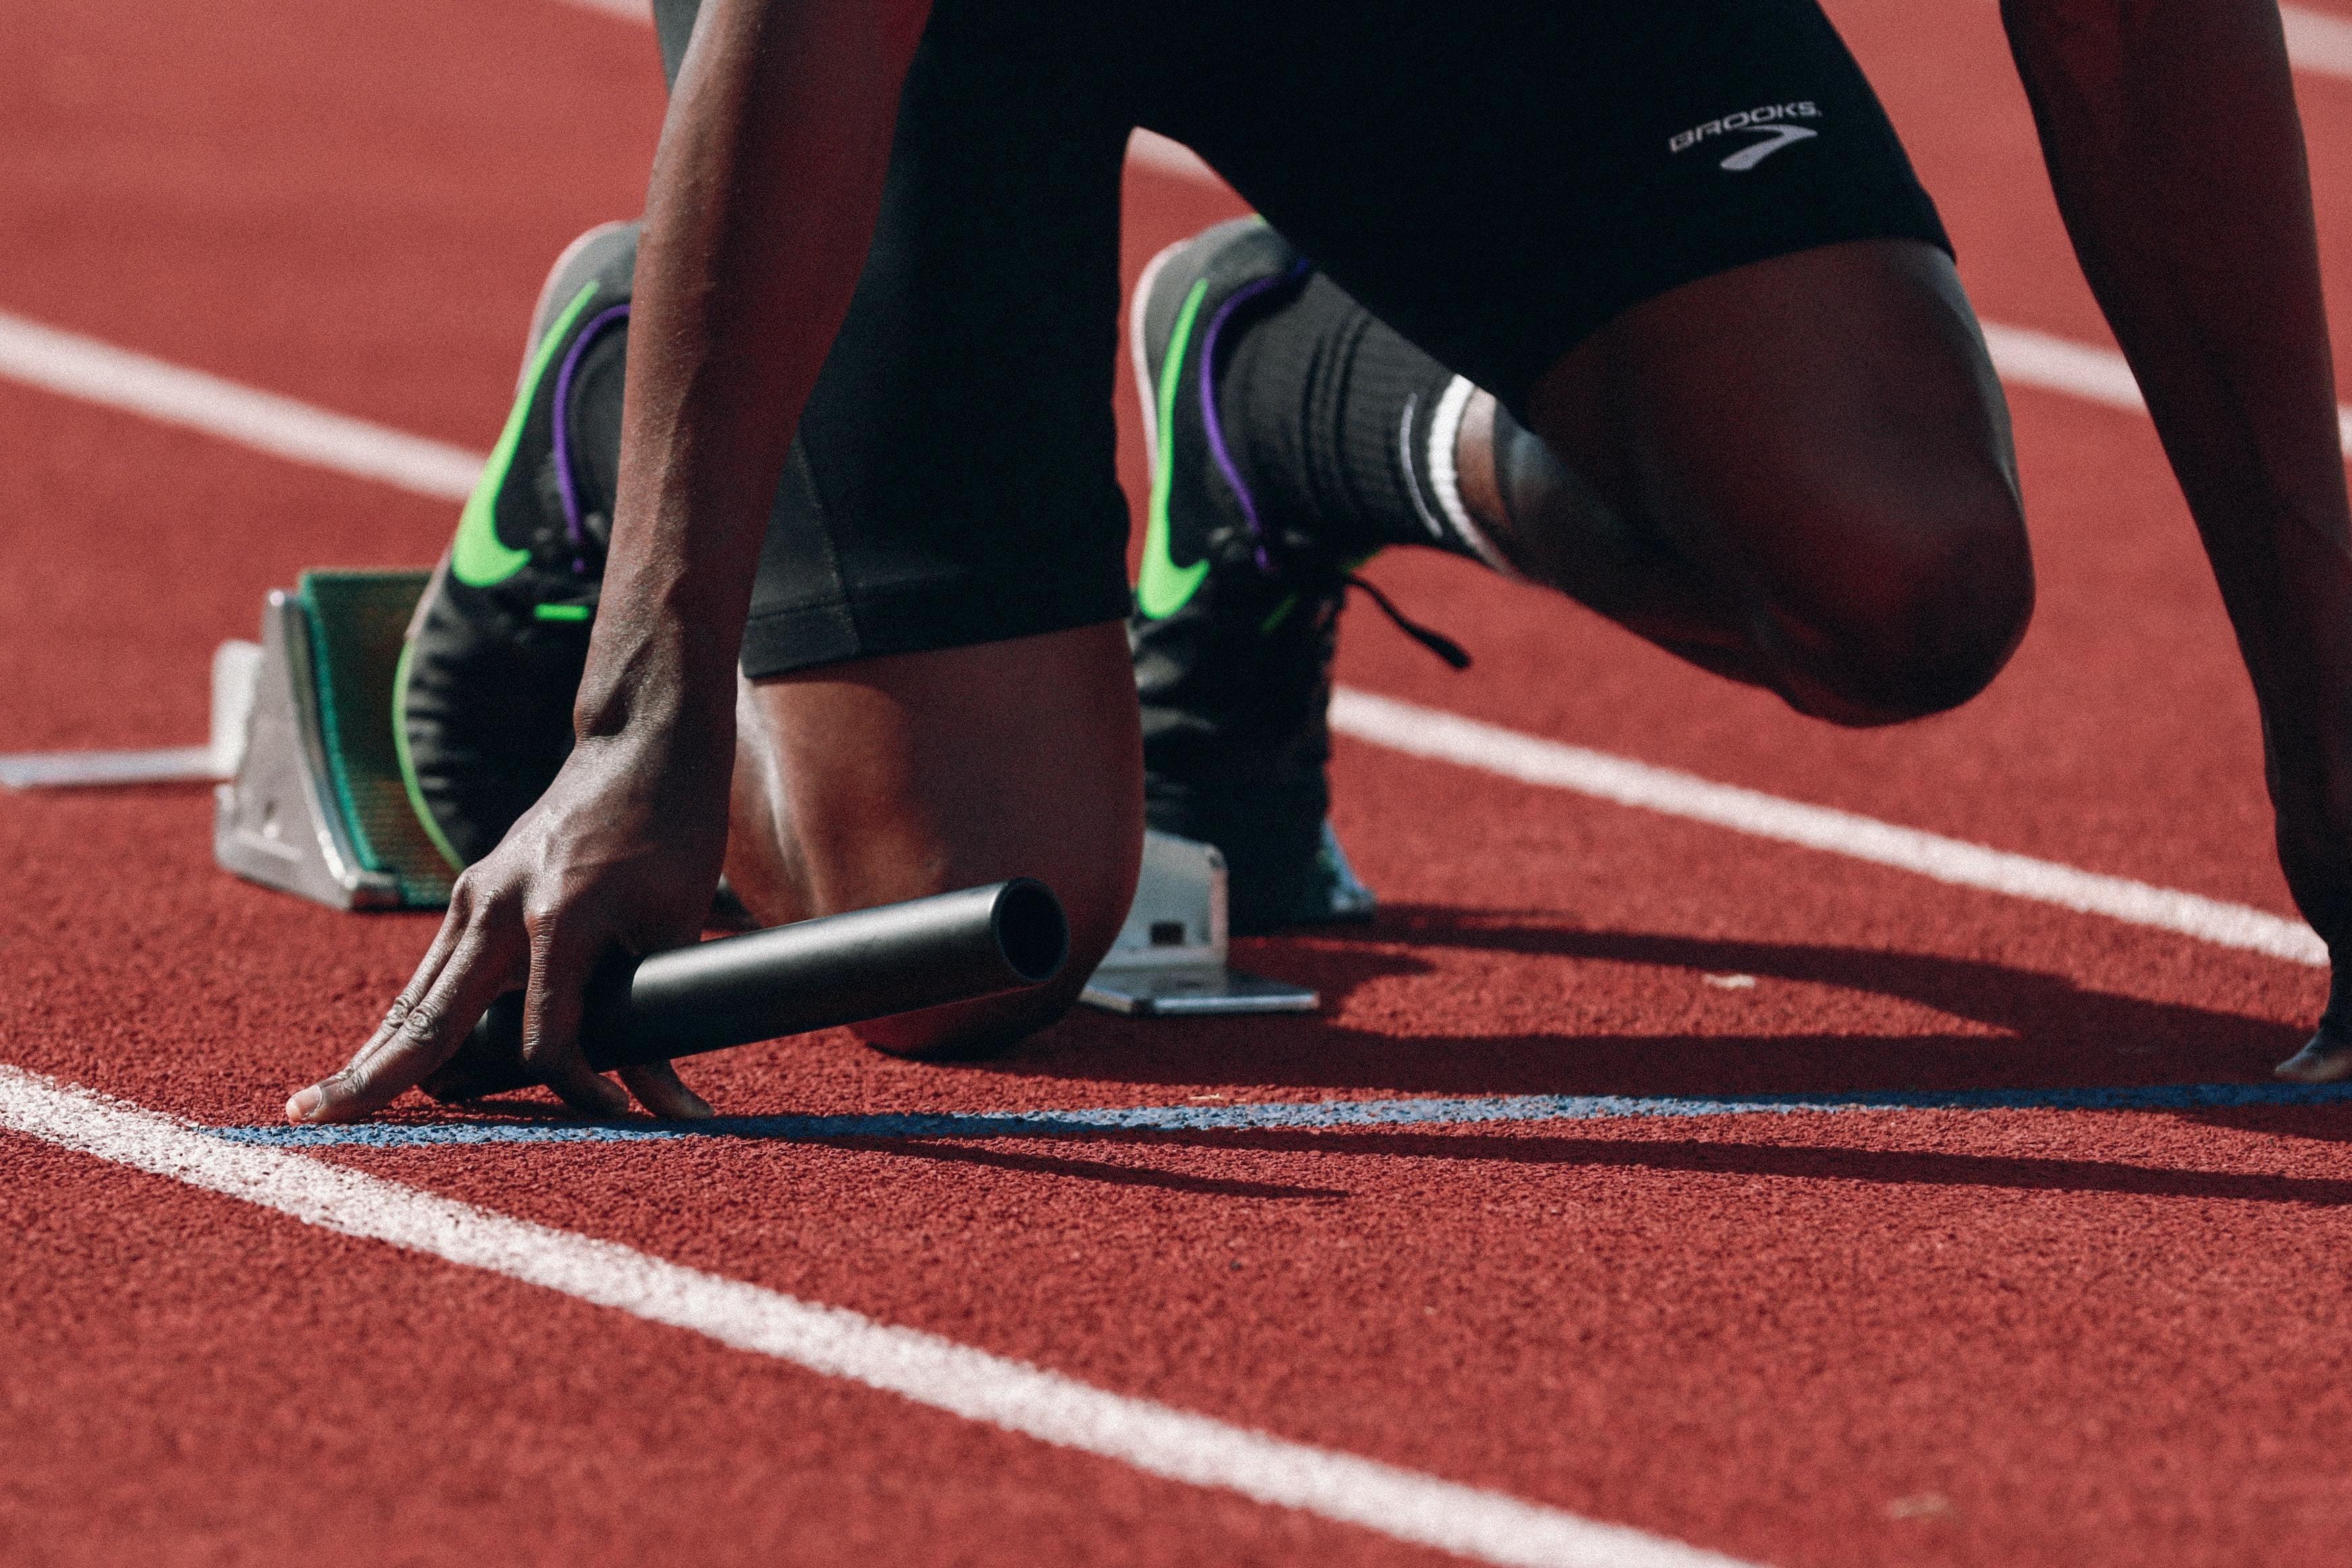 A runner about to start a race.